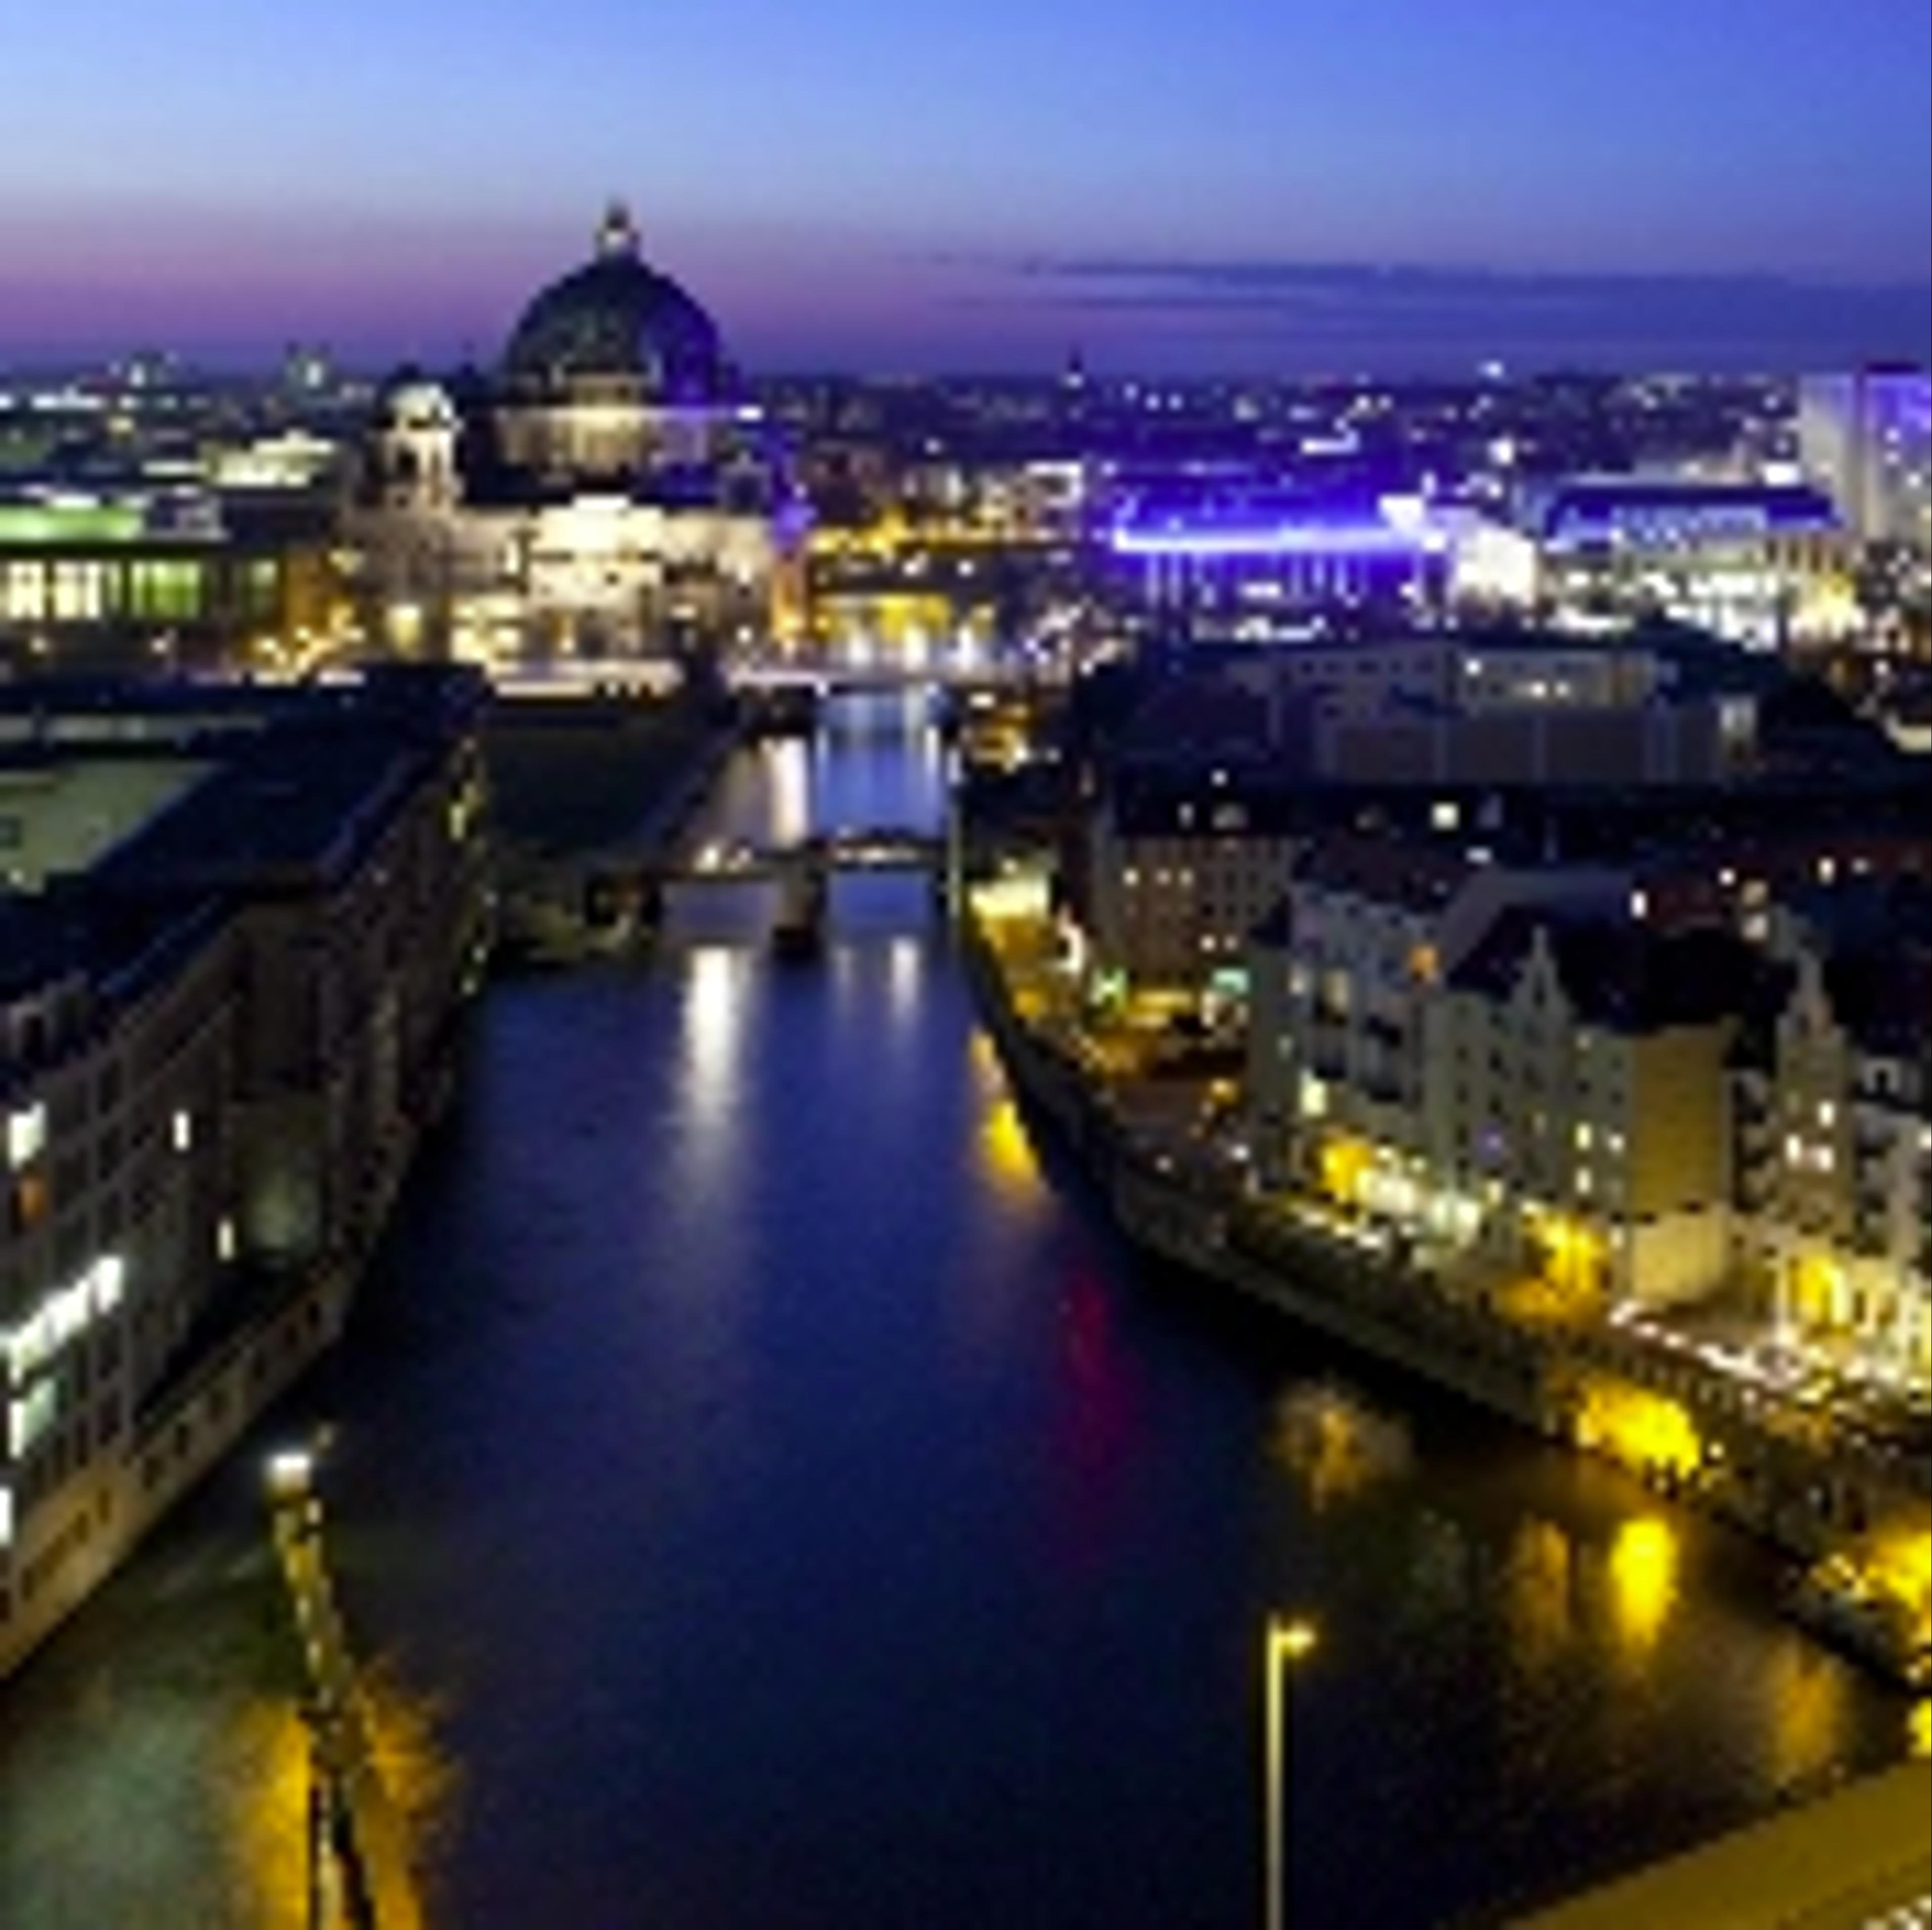 Büro Startups Berlin